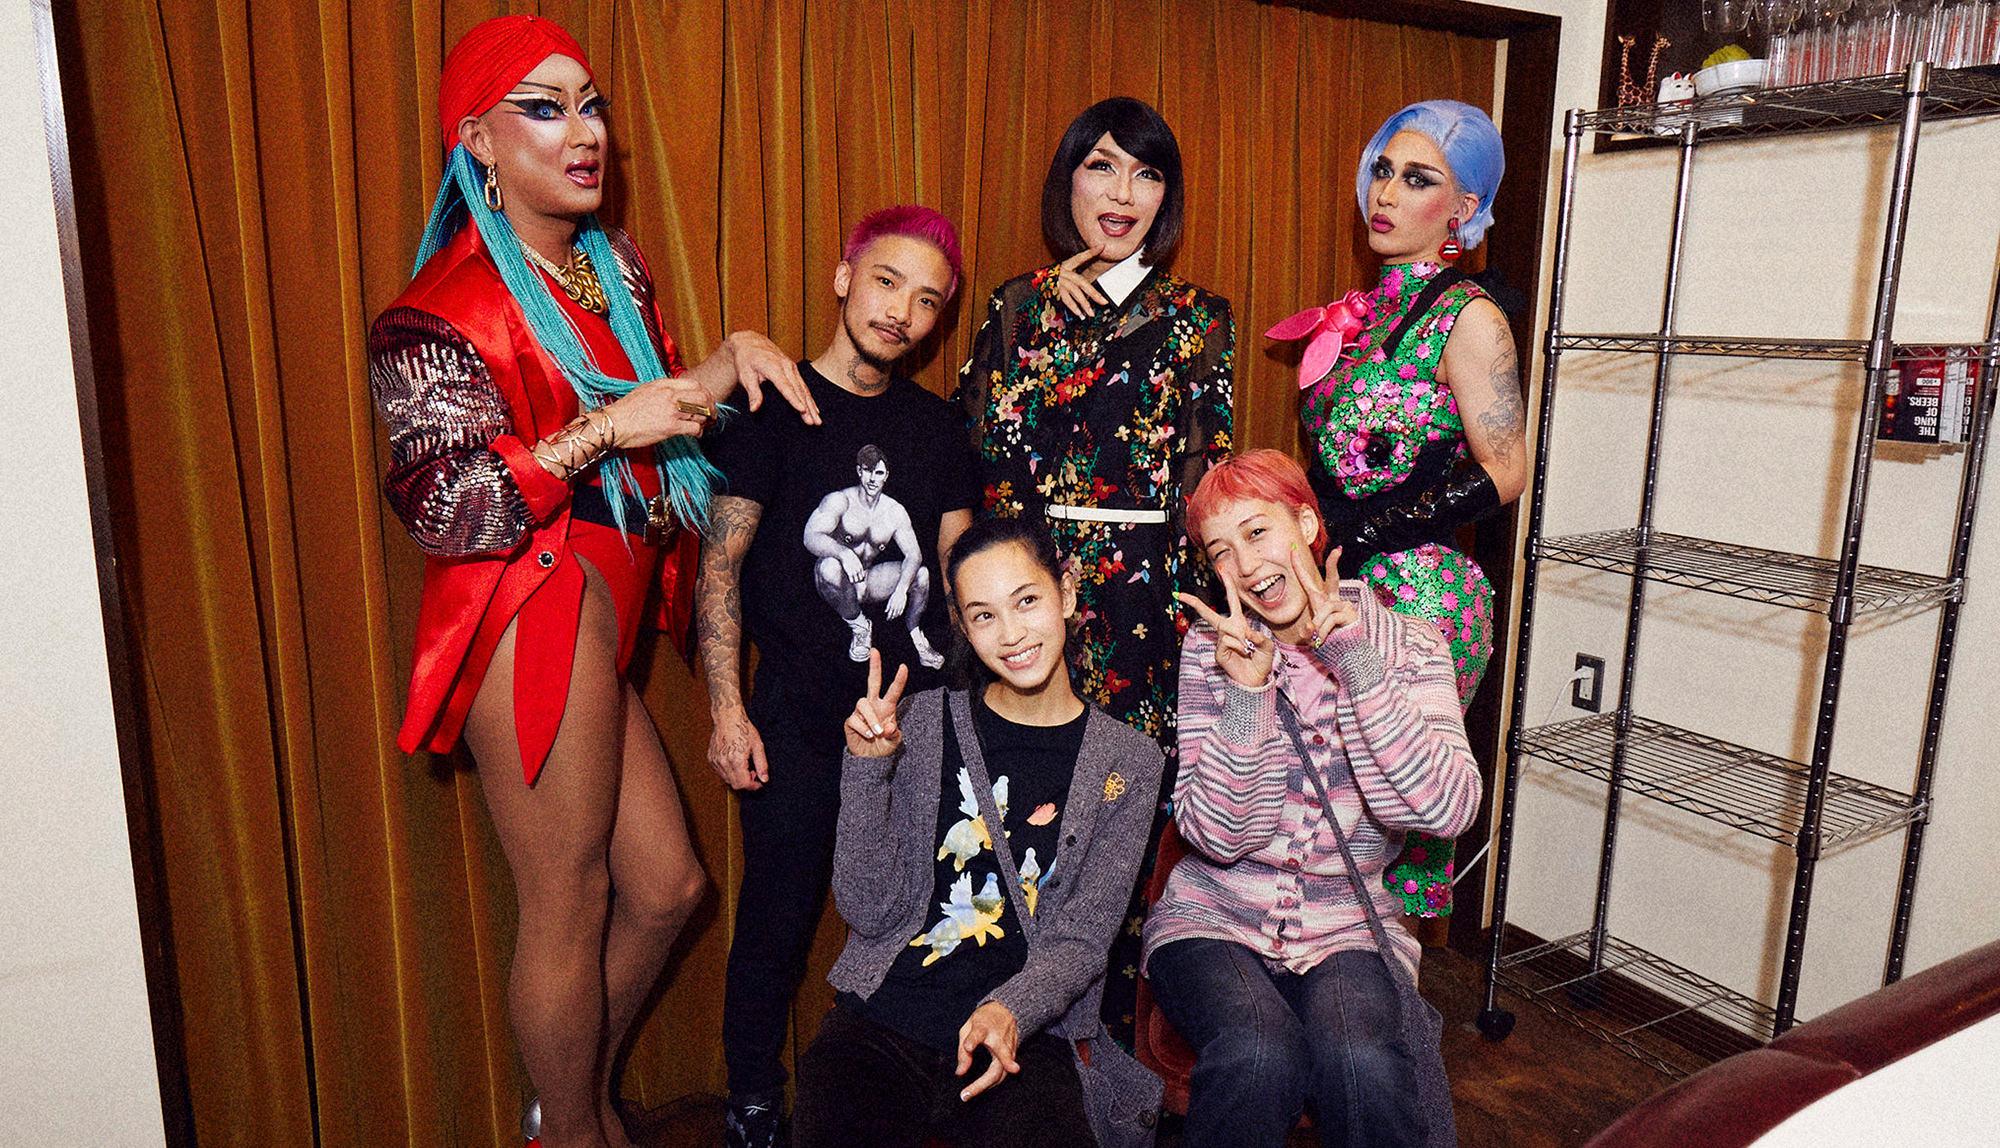 Kiko Mizuhara, Yuka Mizuhara X Campy!bar | Welcome ardent as for anyone! Time that is happy in woman's disguise bar from Shinjuku 2